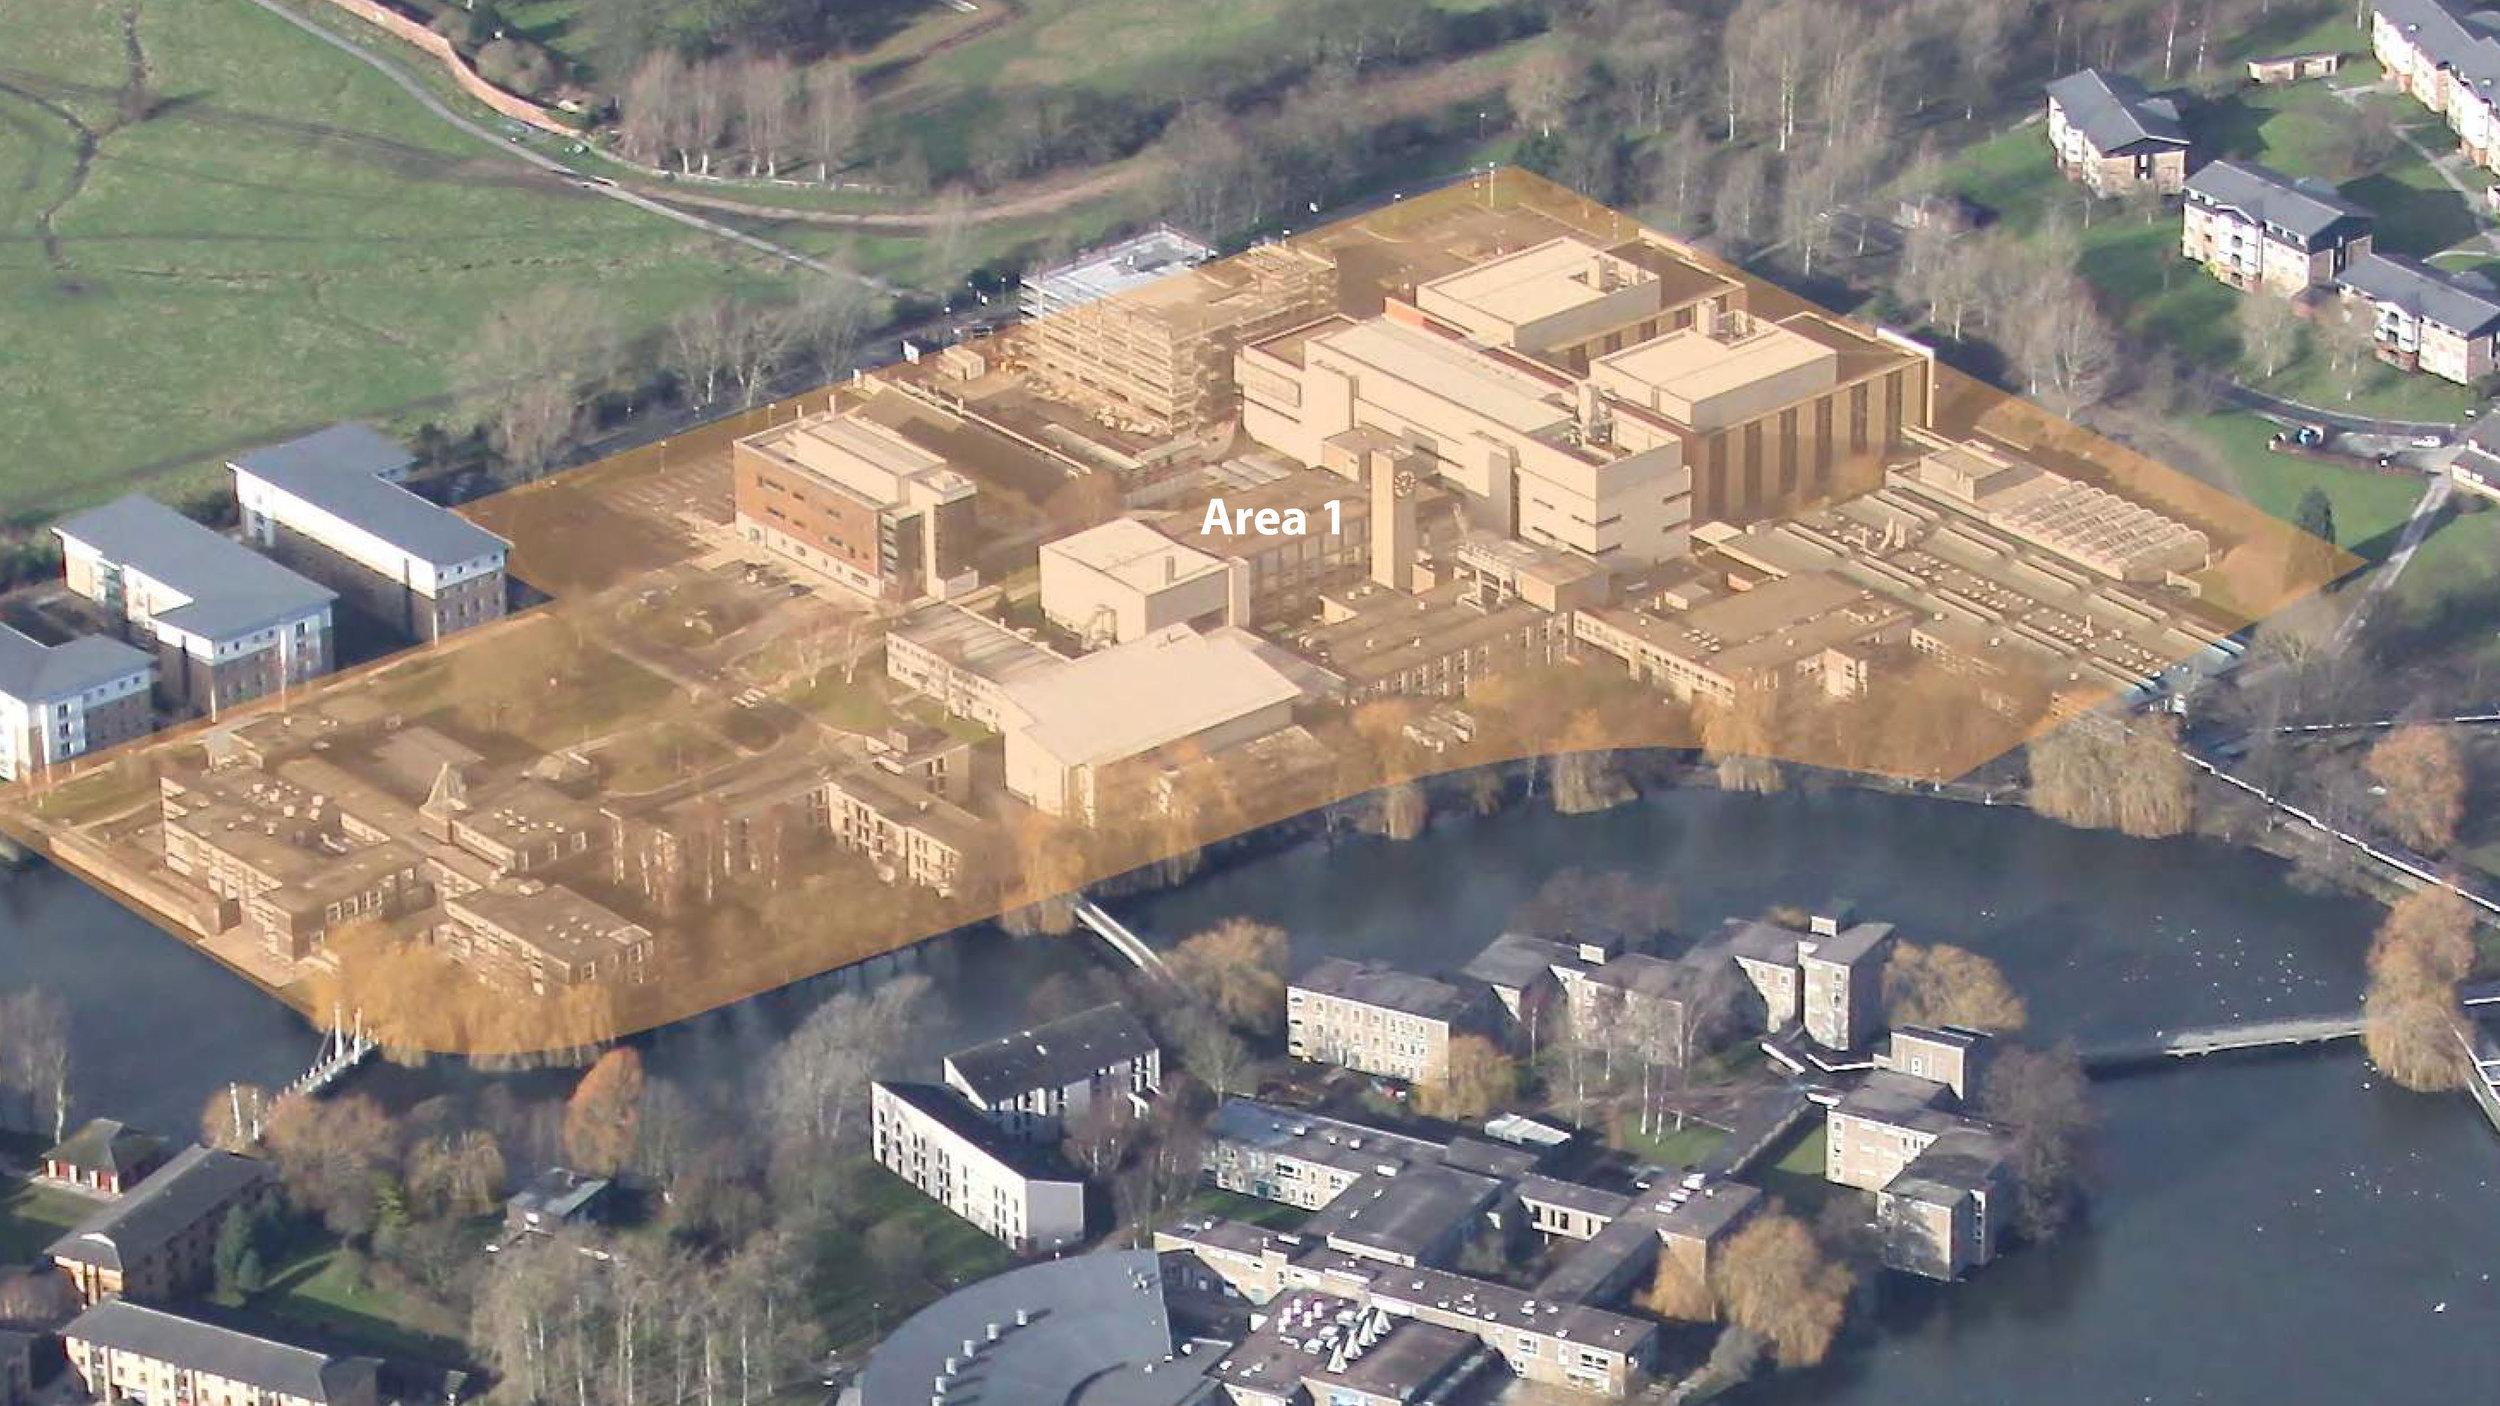 Stephen-Hill-Architects-YorkMasterPlan-04